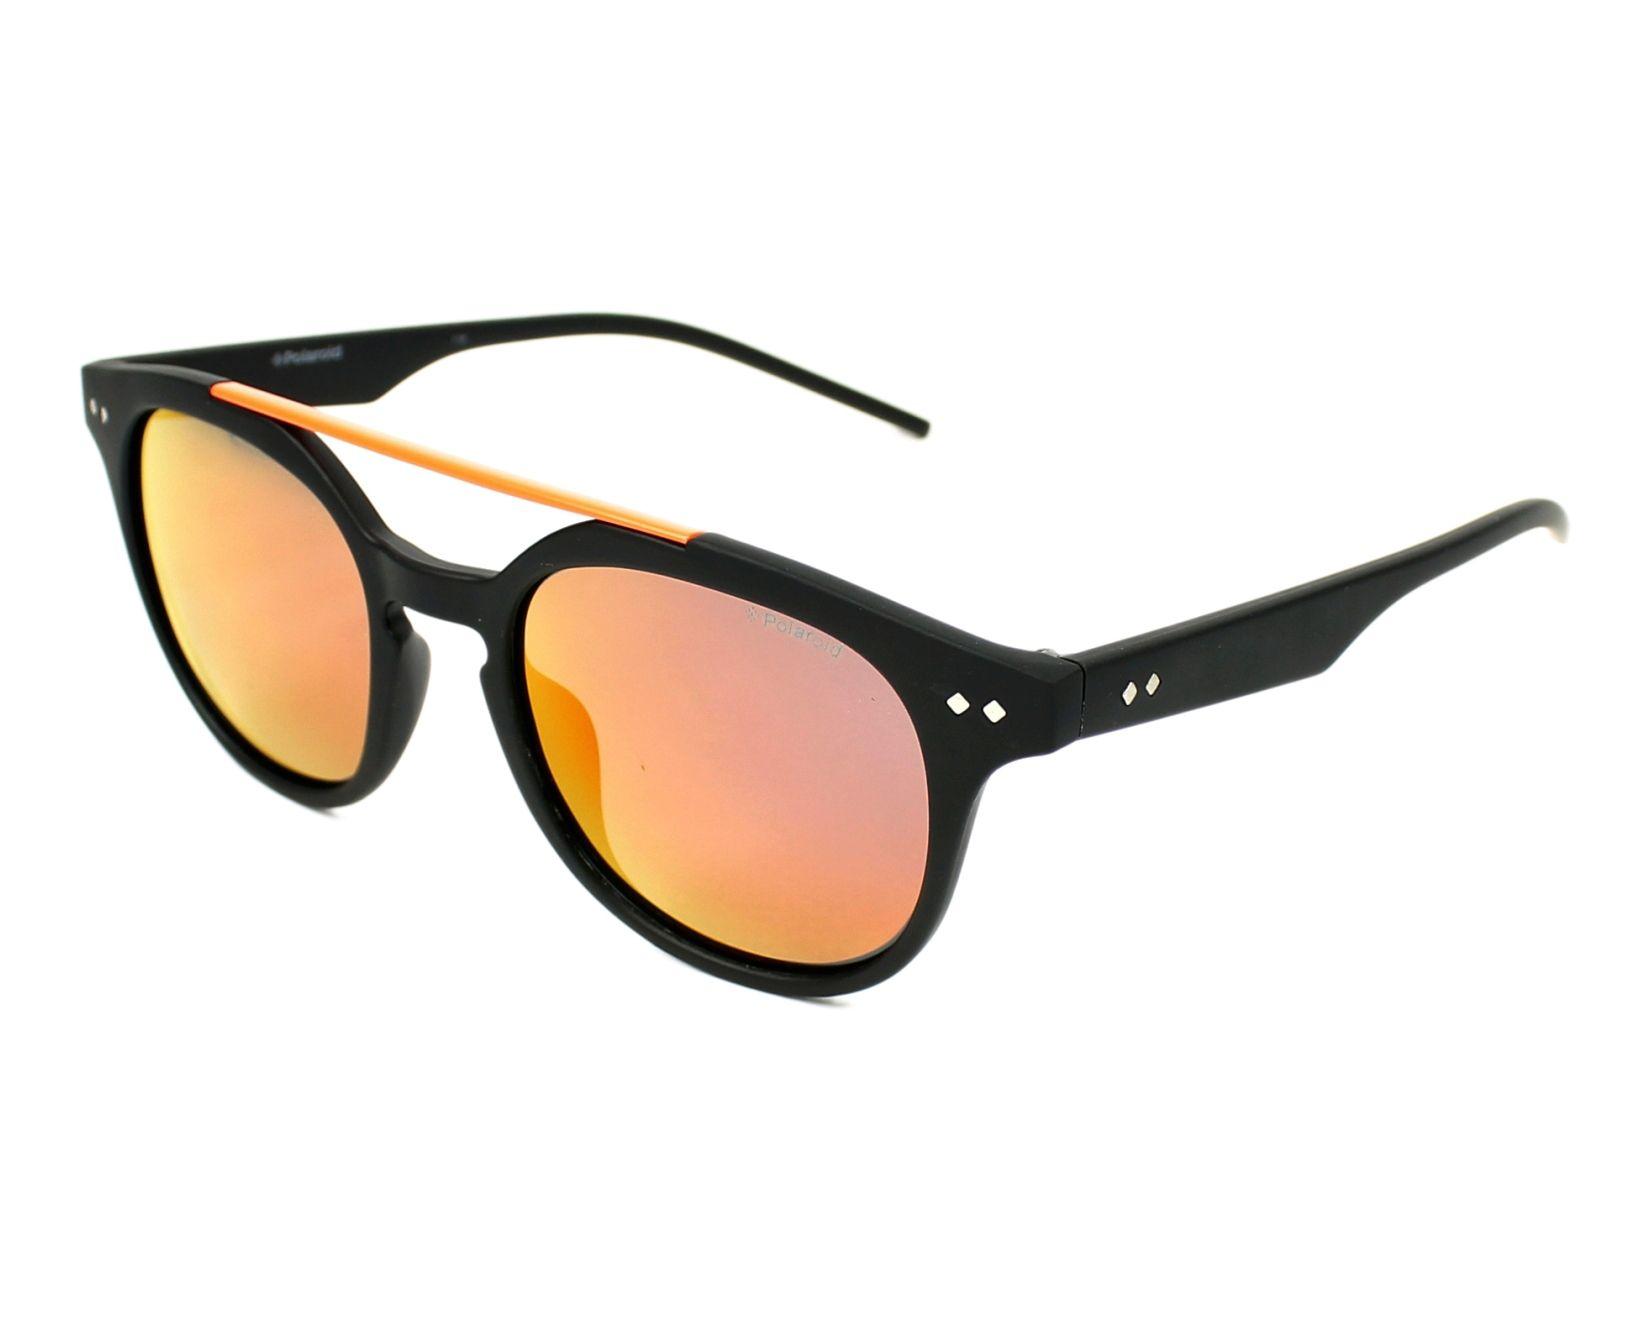 67519da8f3 Polarizadas. Gafas Graduadas Polaroid PLD-1023-S DL5/OZ 51-20 Negra Naranja